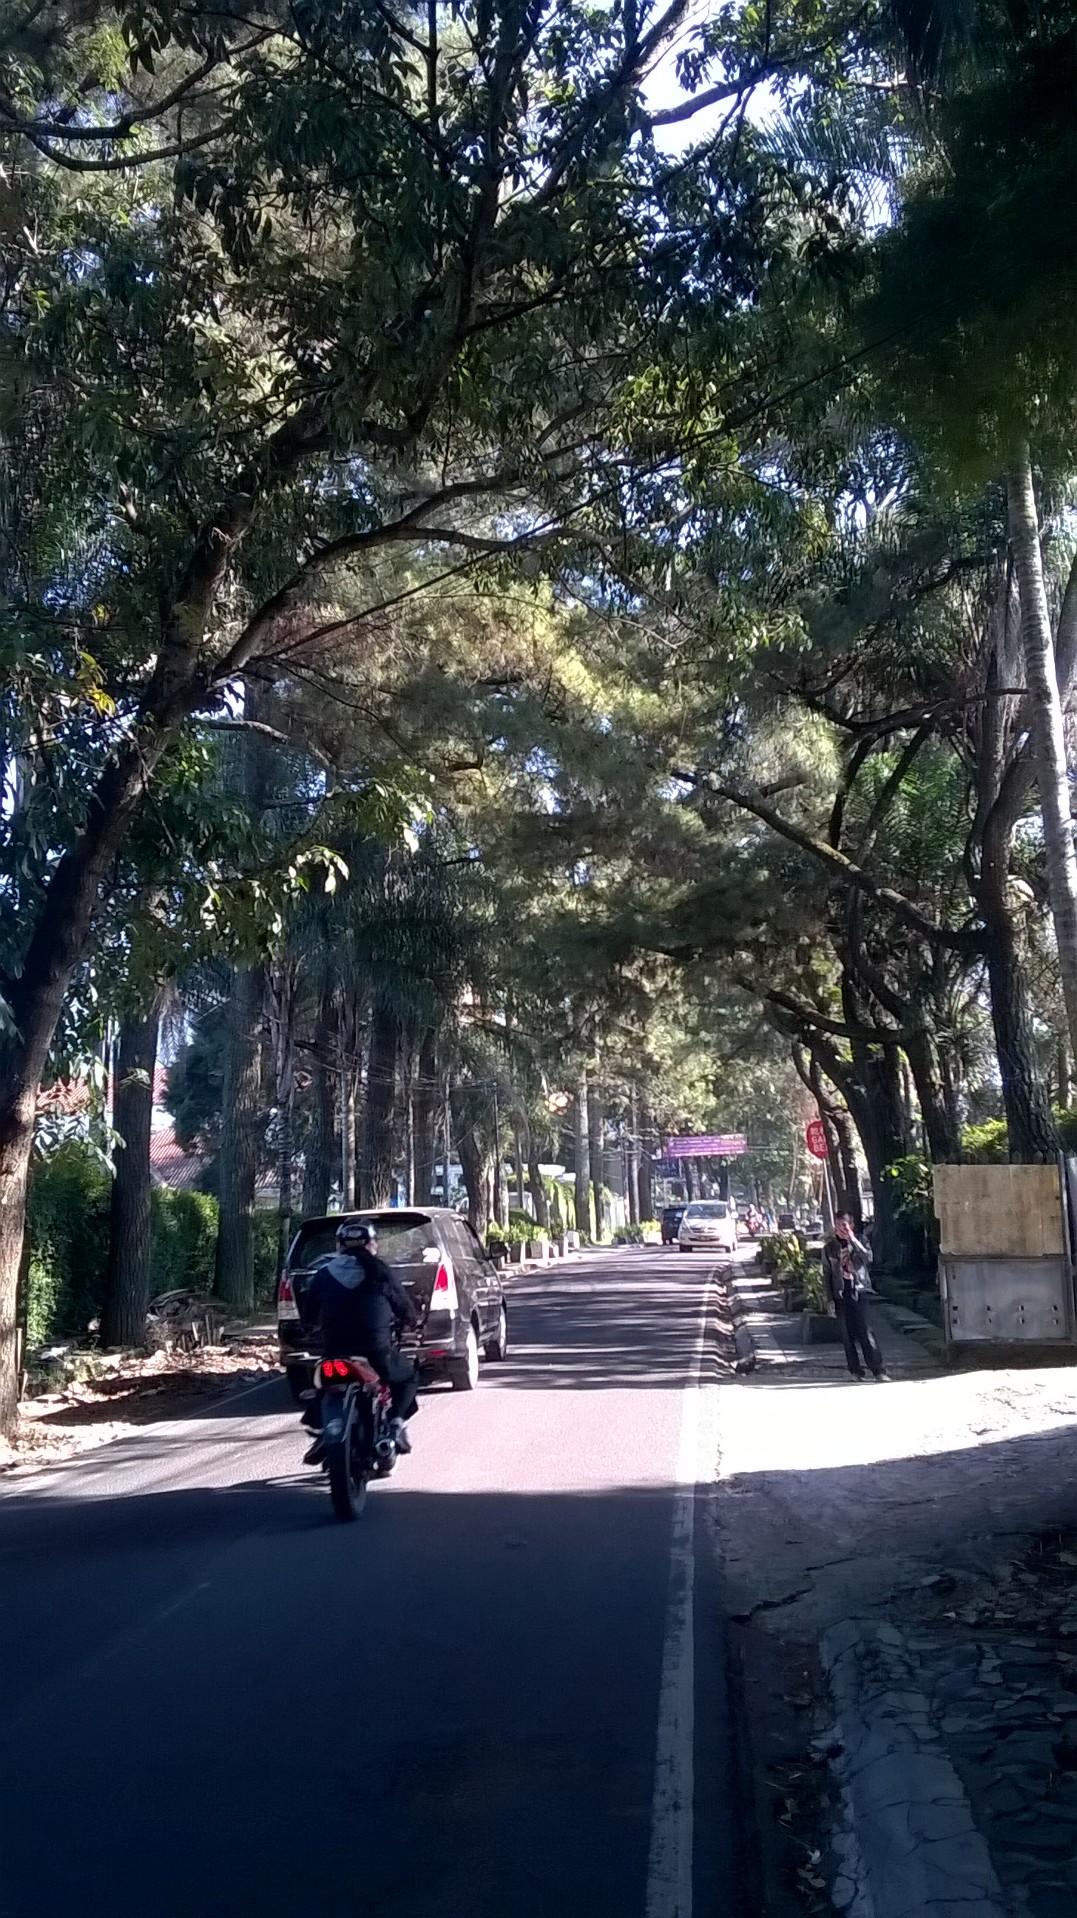 More greeneries in Hegarmanah street.